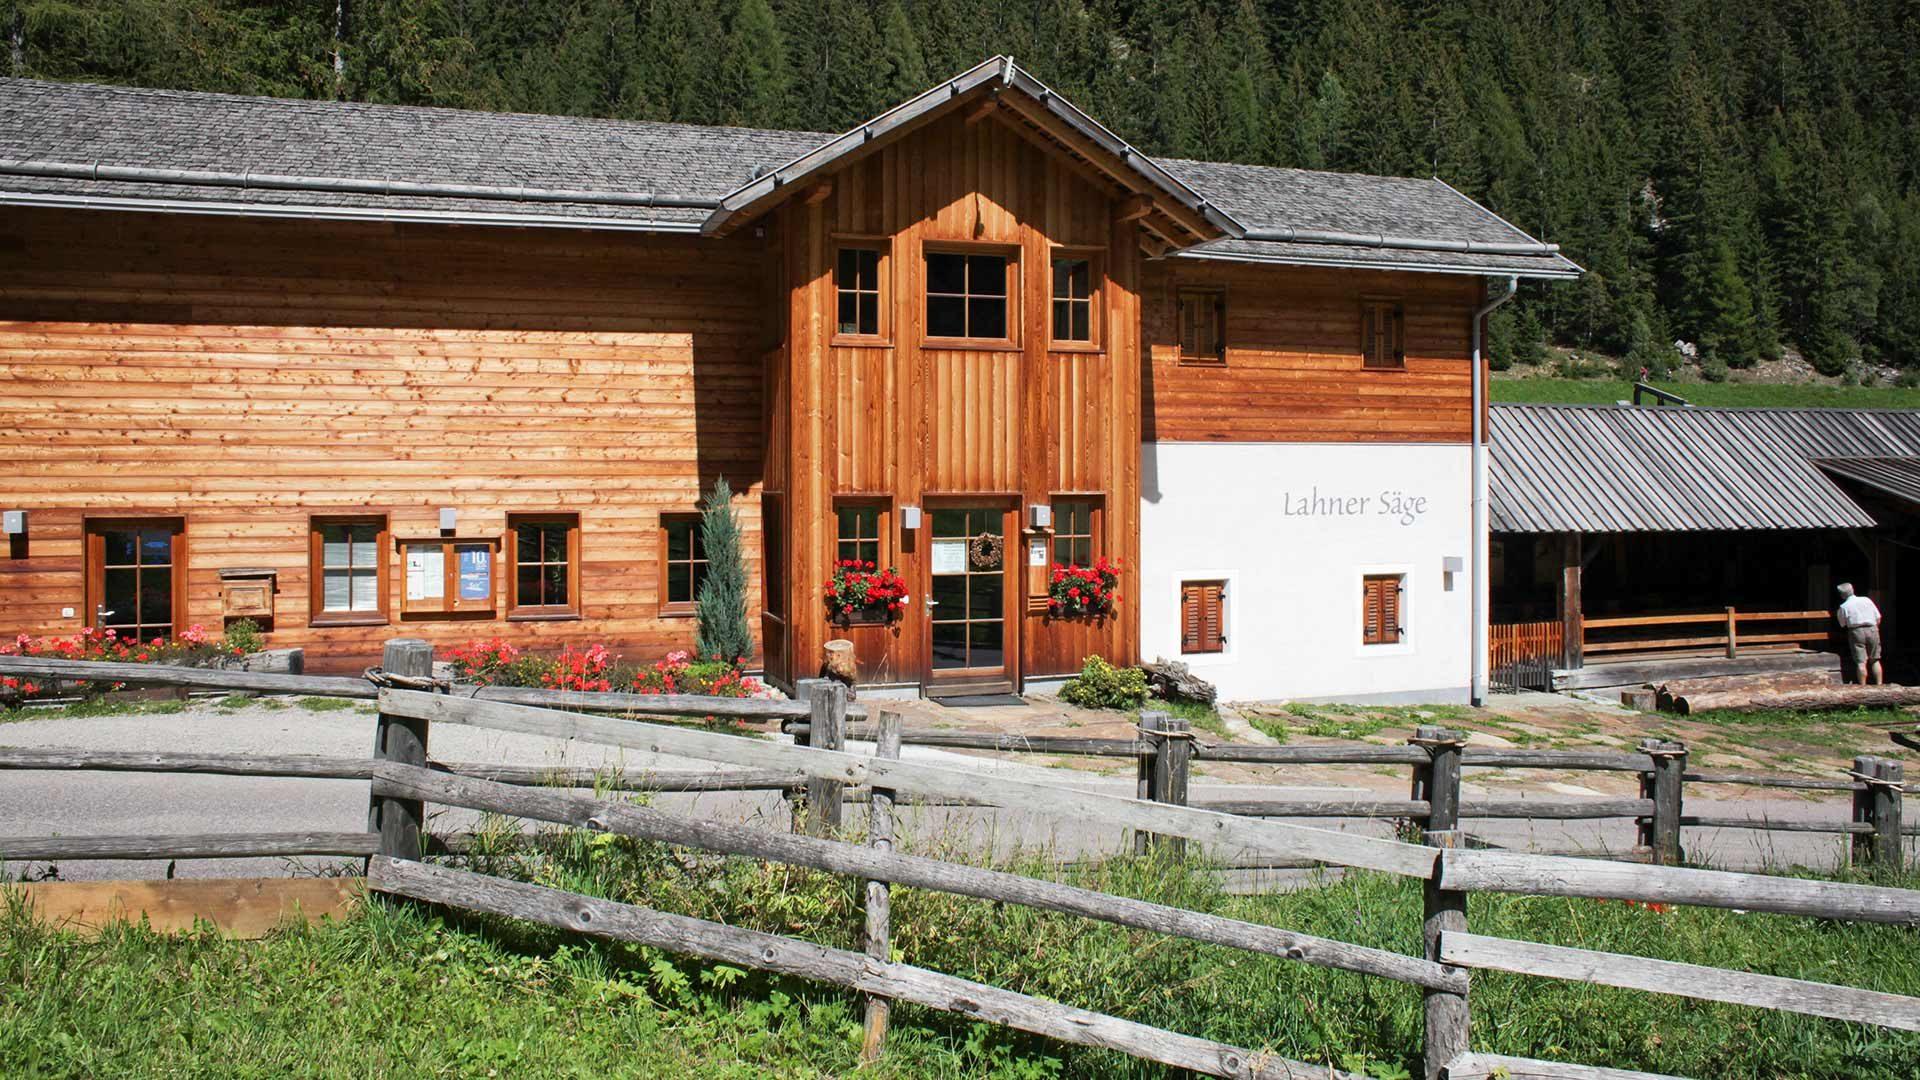 Nationalparkhaus Lahnersäge im Ultental